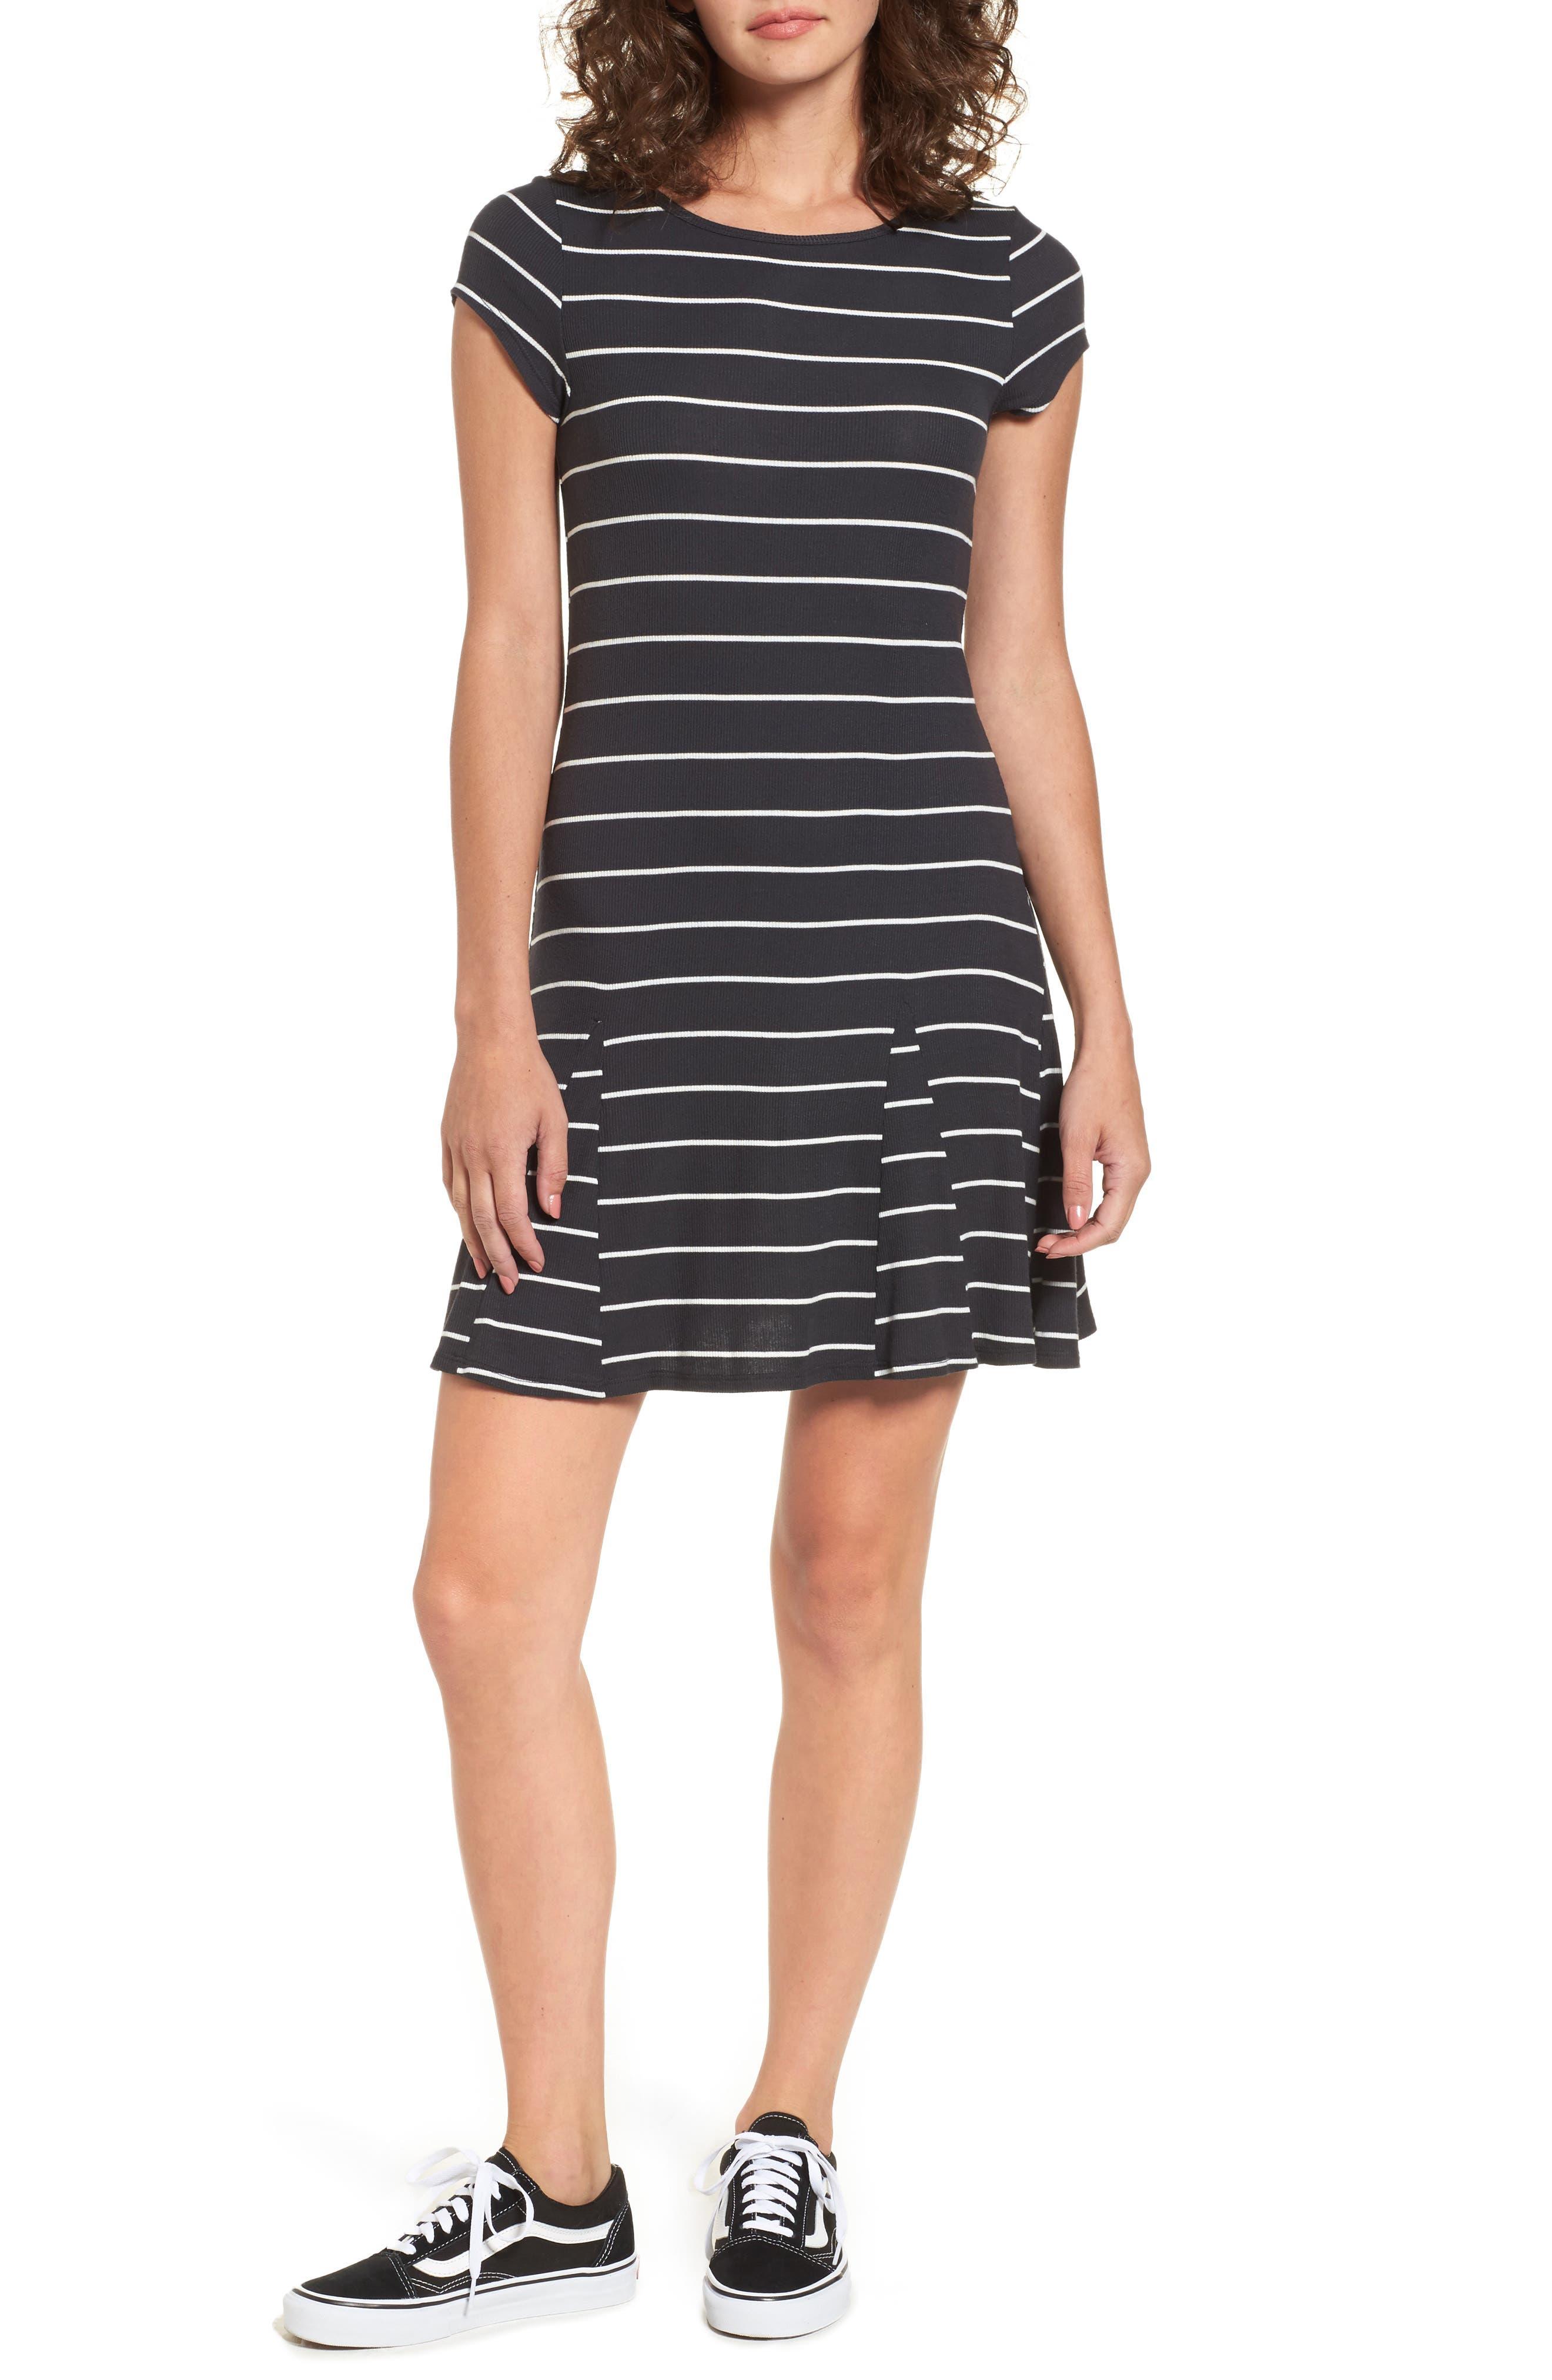 Alternate Image 1 Selected - Billabong Rockin Down Stripe T-Shirt Dress